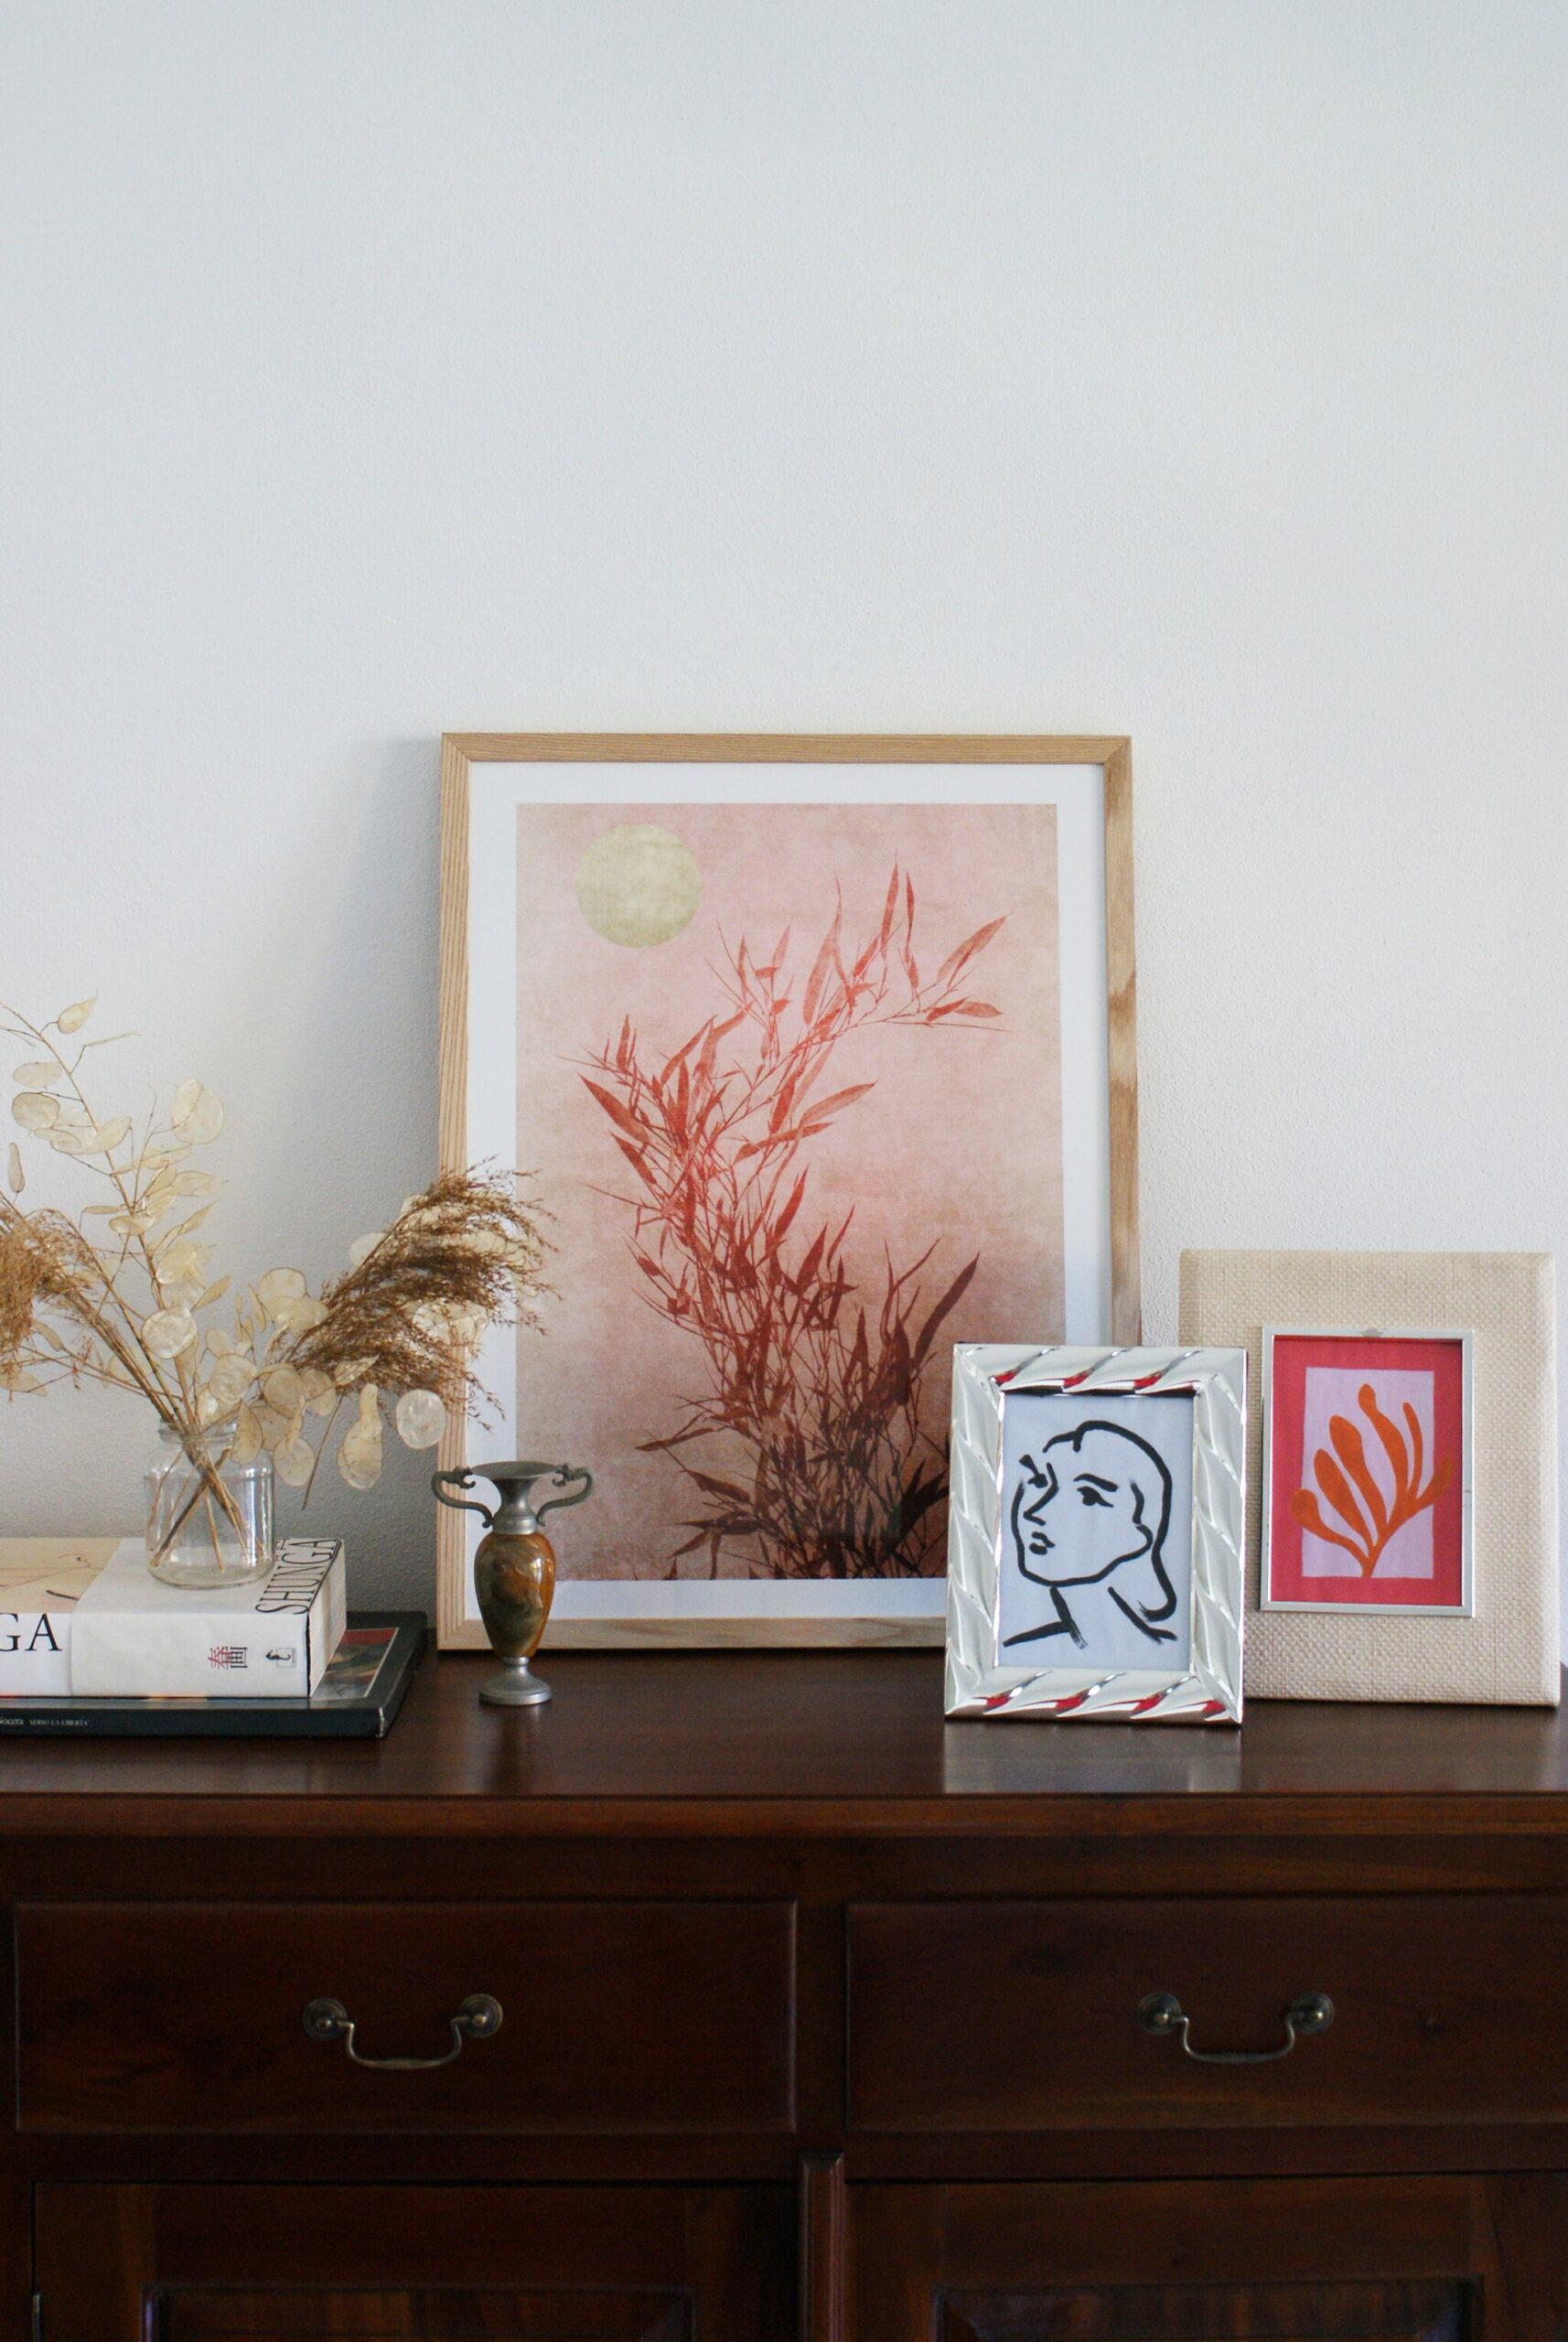 dipinti fai da te fare casa henri matisse arte ispirati tutorial pittura facile principiante